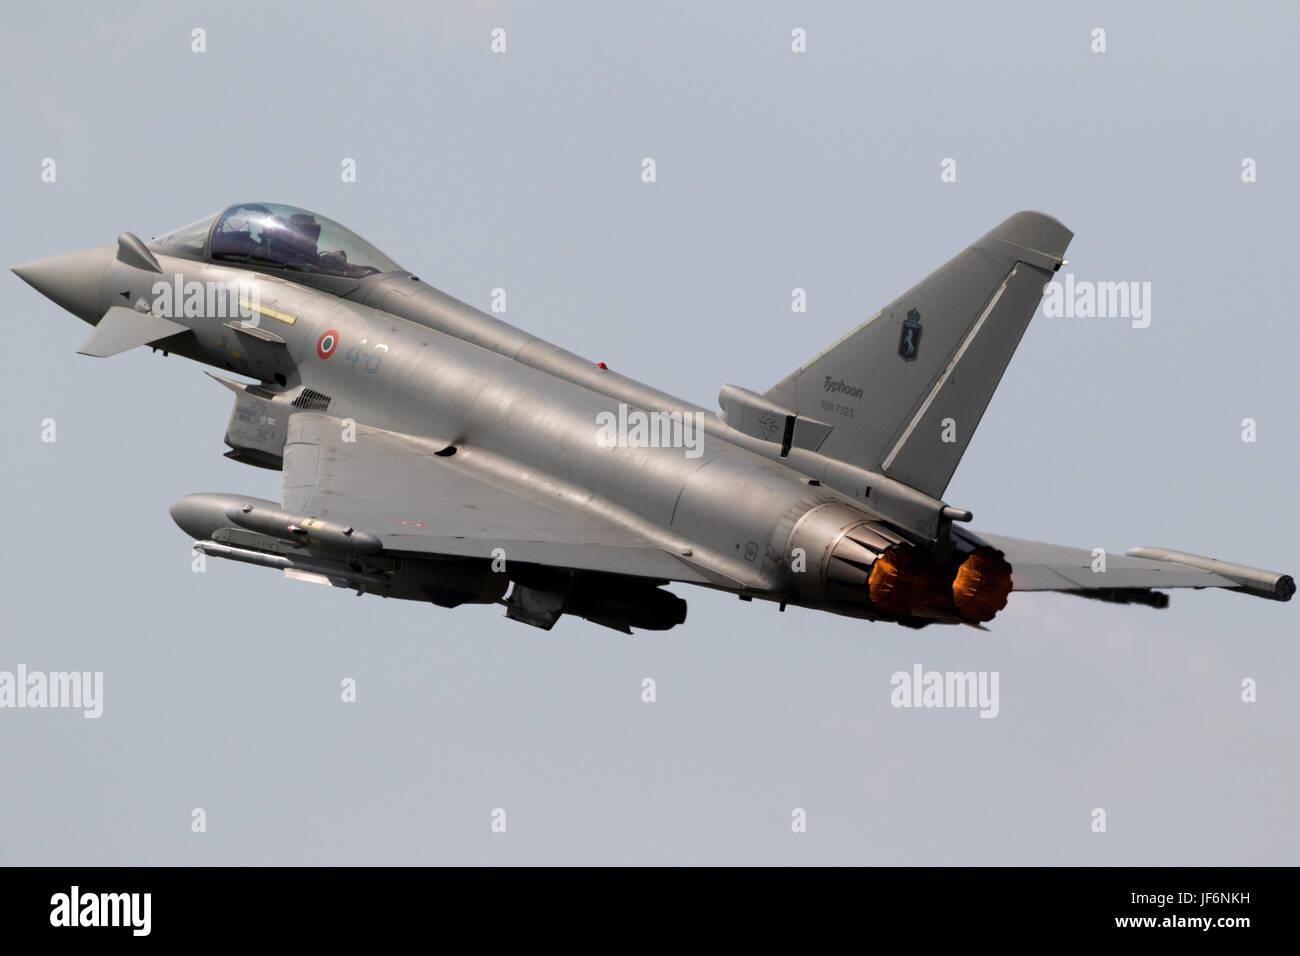 FLORENNES, BELGIUM - JUN 15, 2017: Italian Air Force Eurofighter Typhoon fighter jet take off flyby. Stock Photo